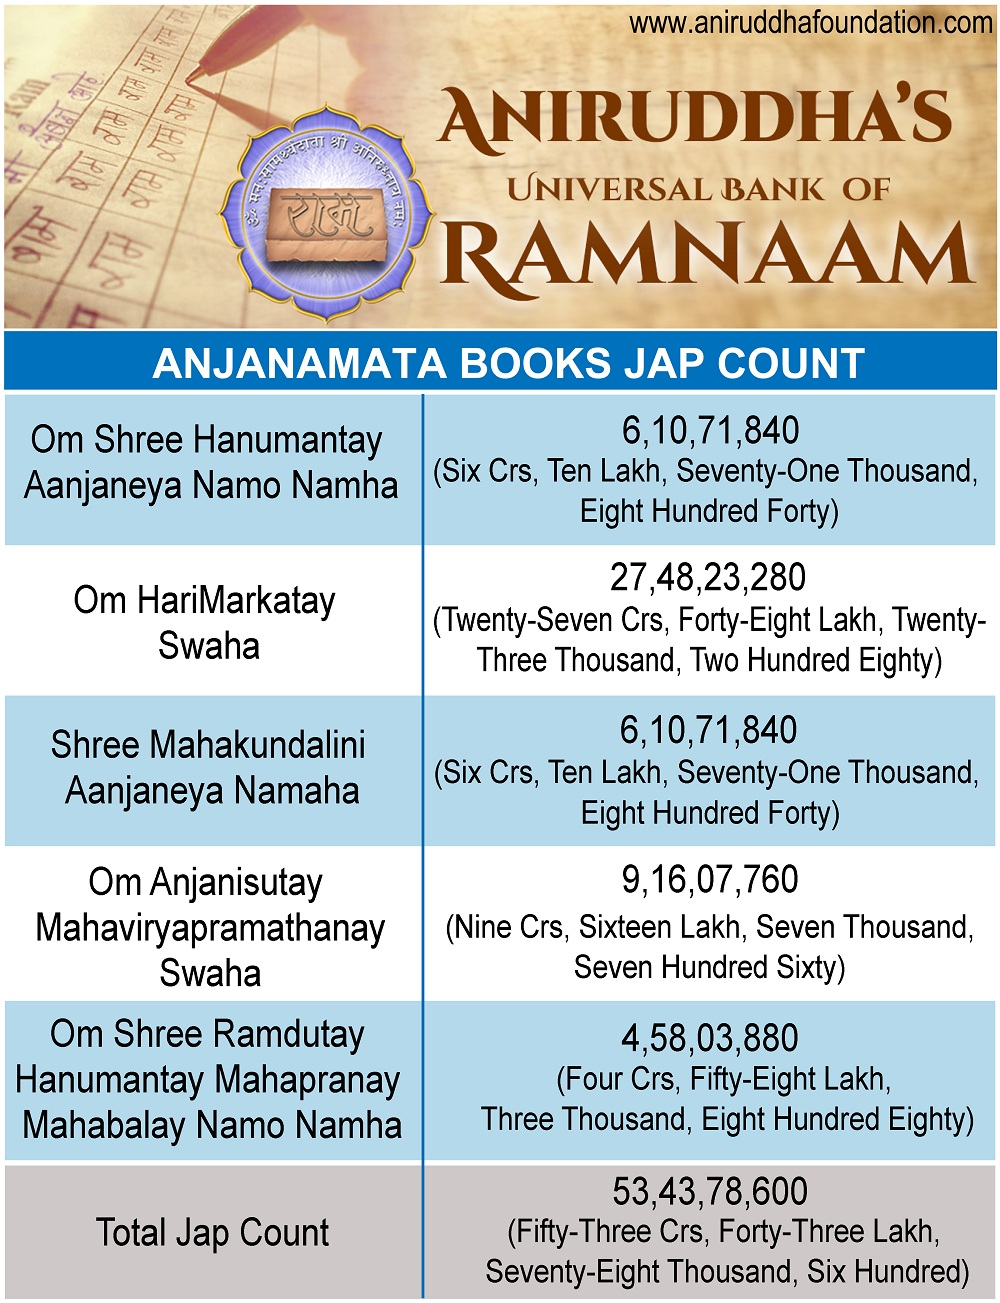 Anjanamata Book Count